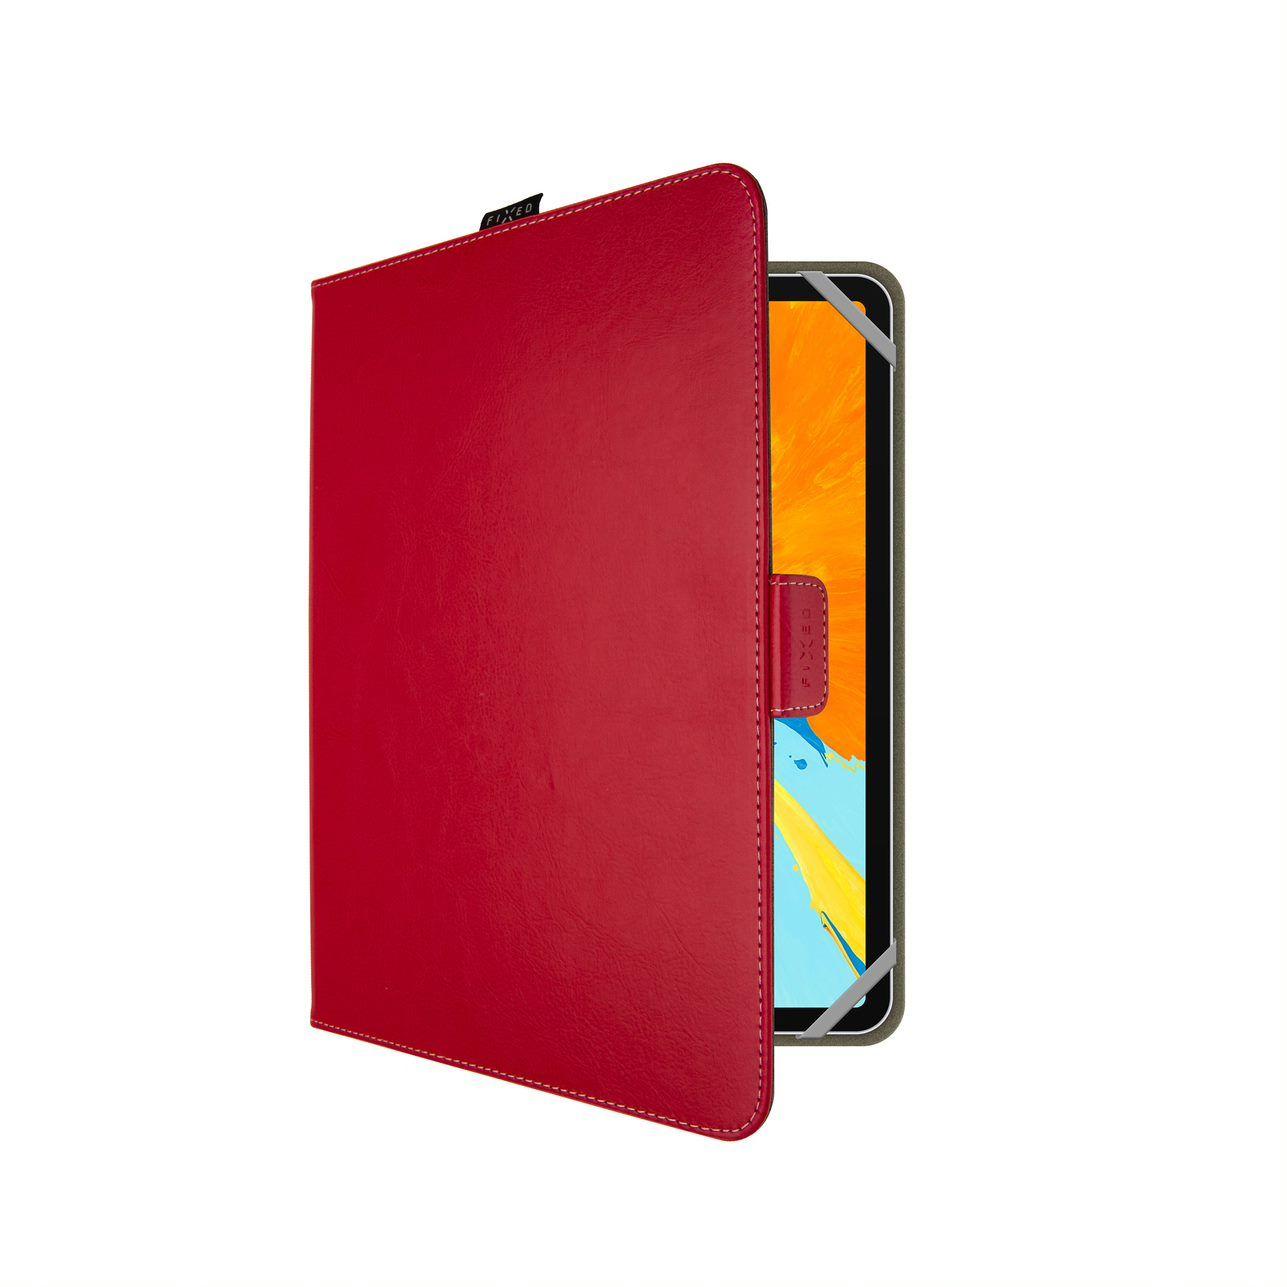 Pouzdro pro 10,1'' tablety FIXED Novel, červené - FIXNOV-T10-RD